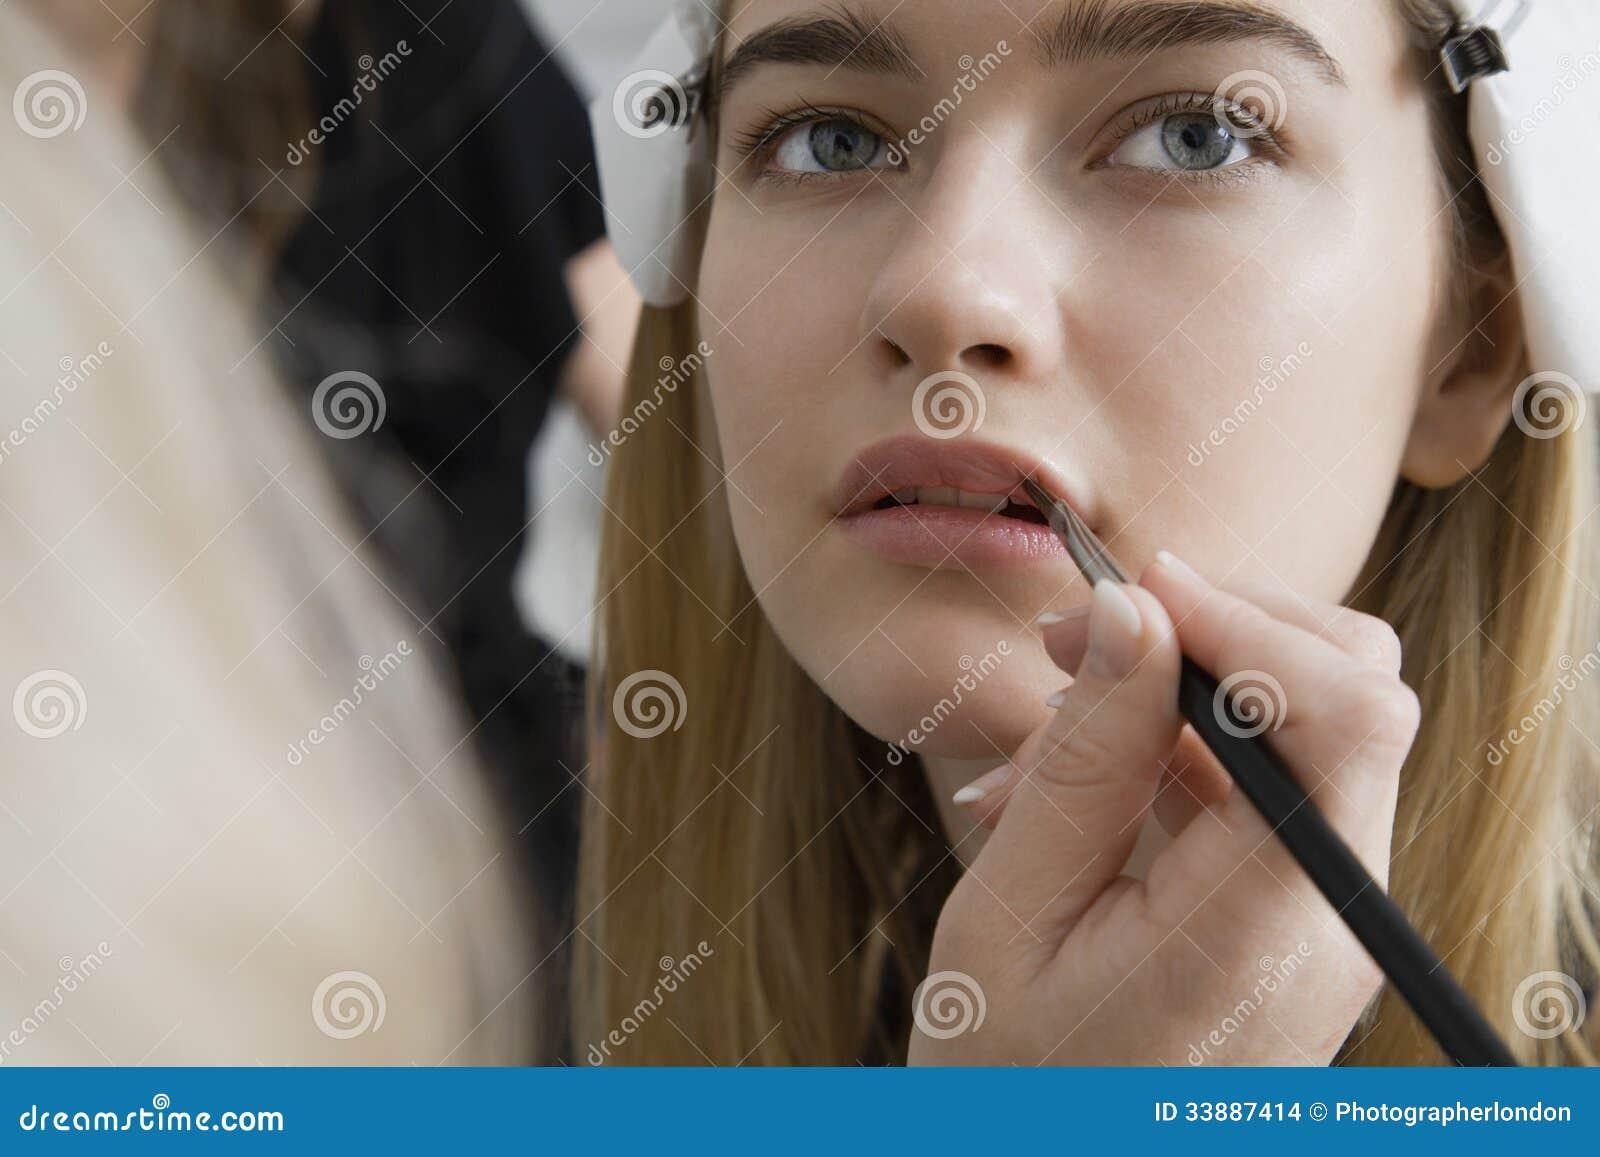 Modell Having Makeup Applied